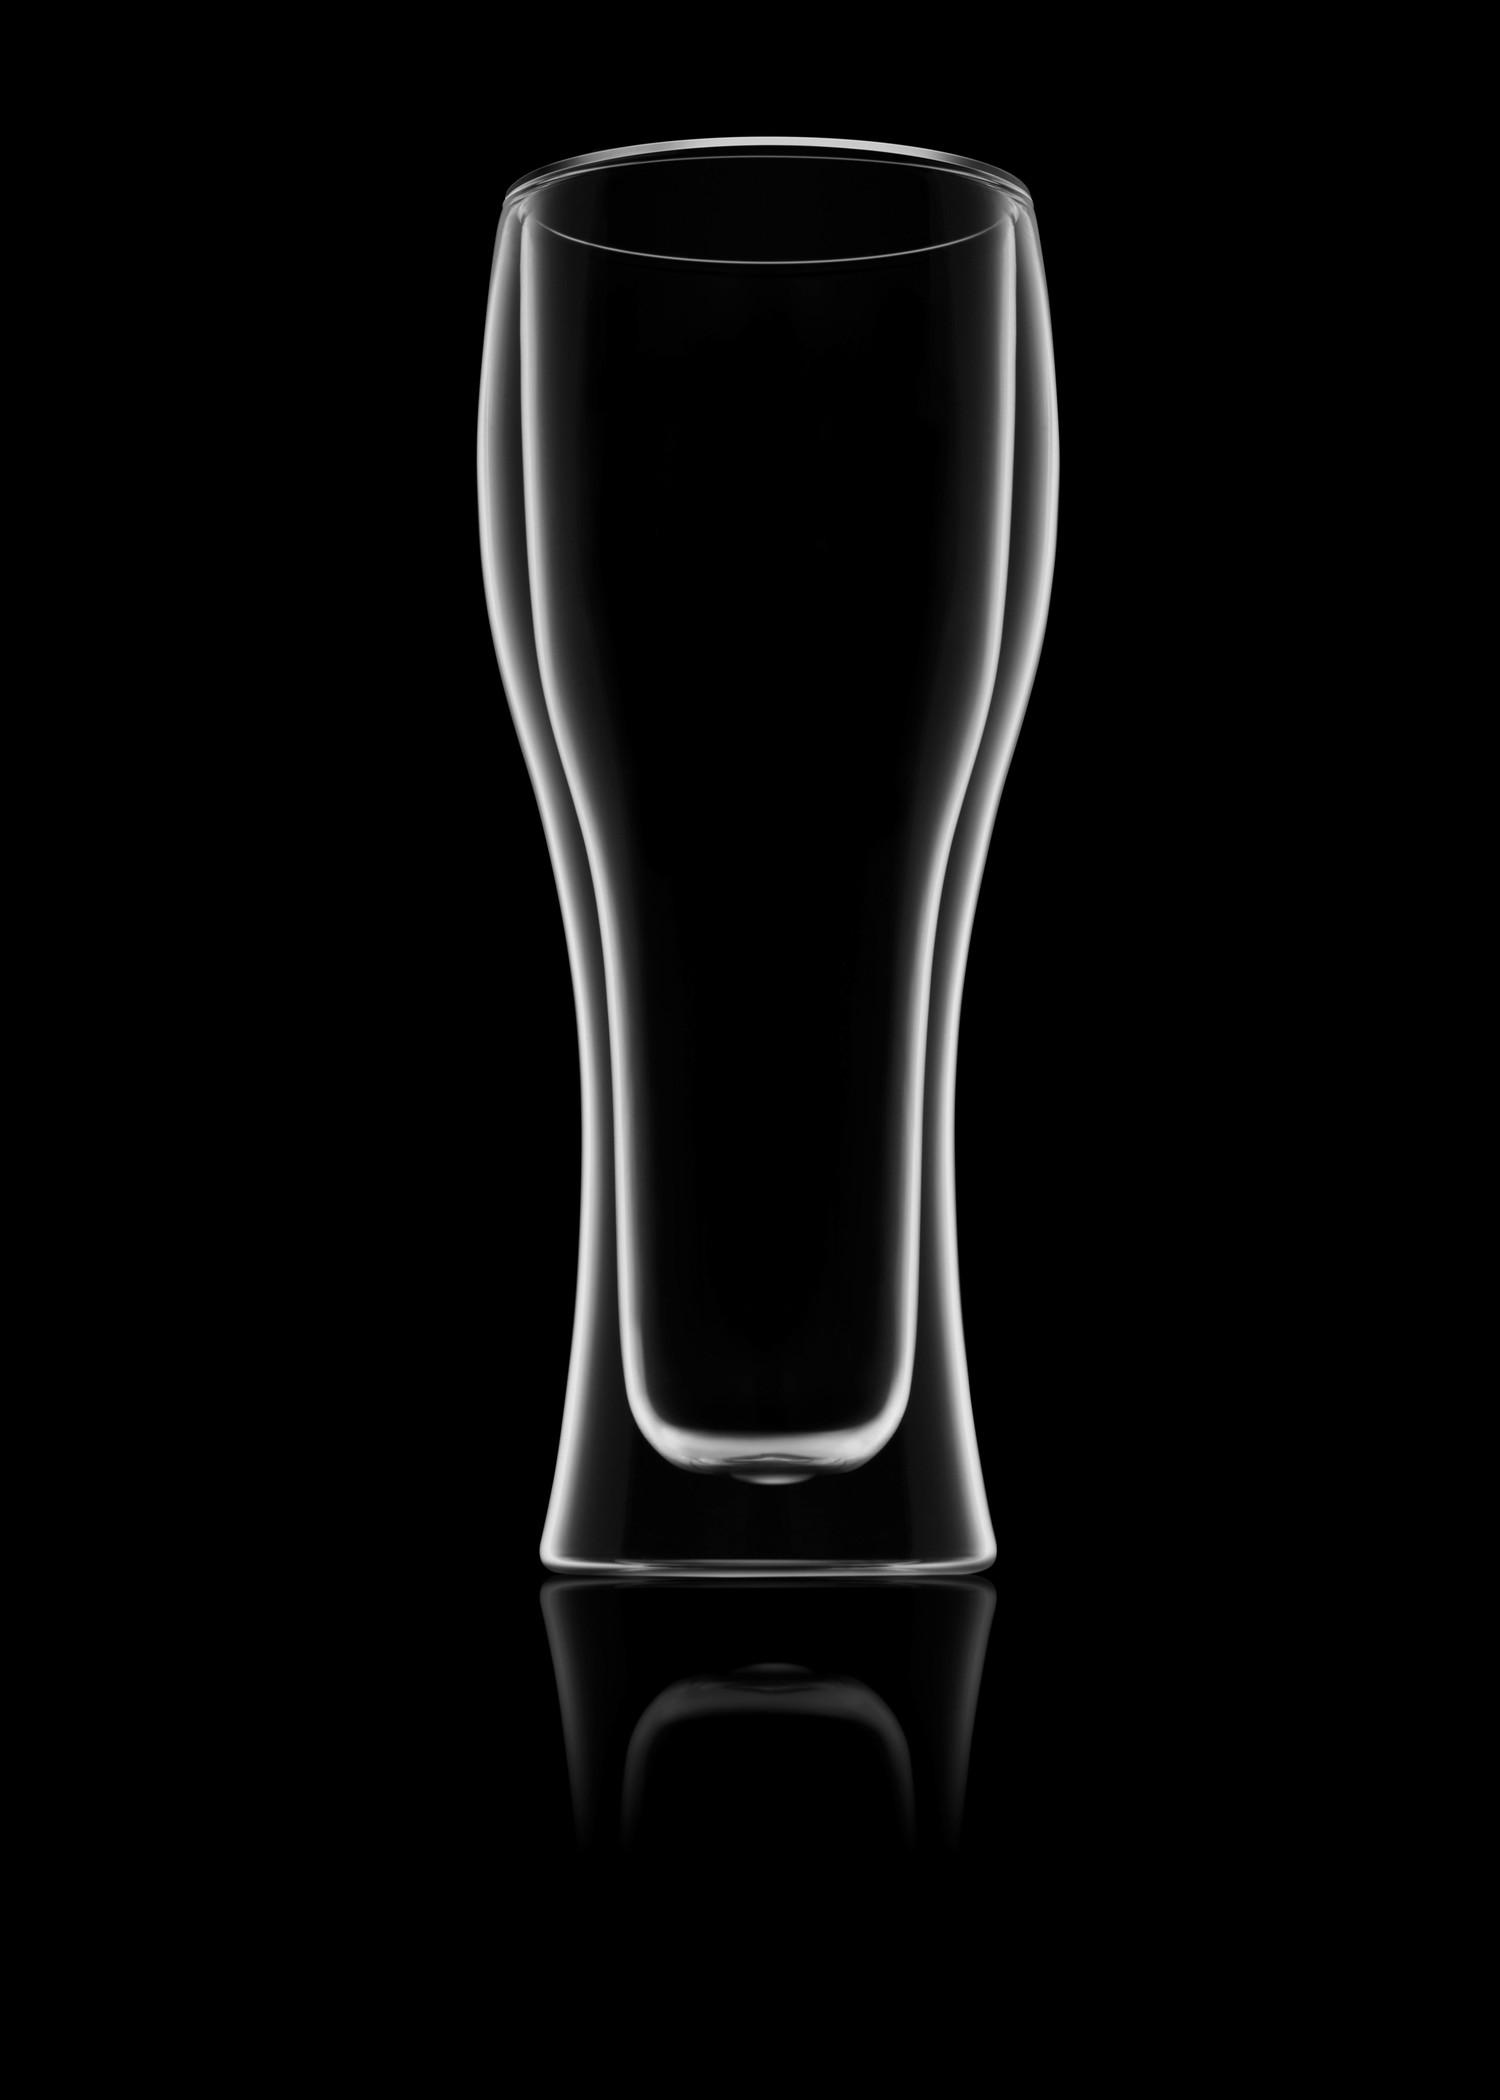 Double+walled+glass+9666.jpg